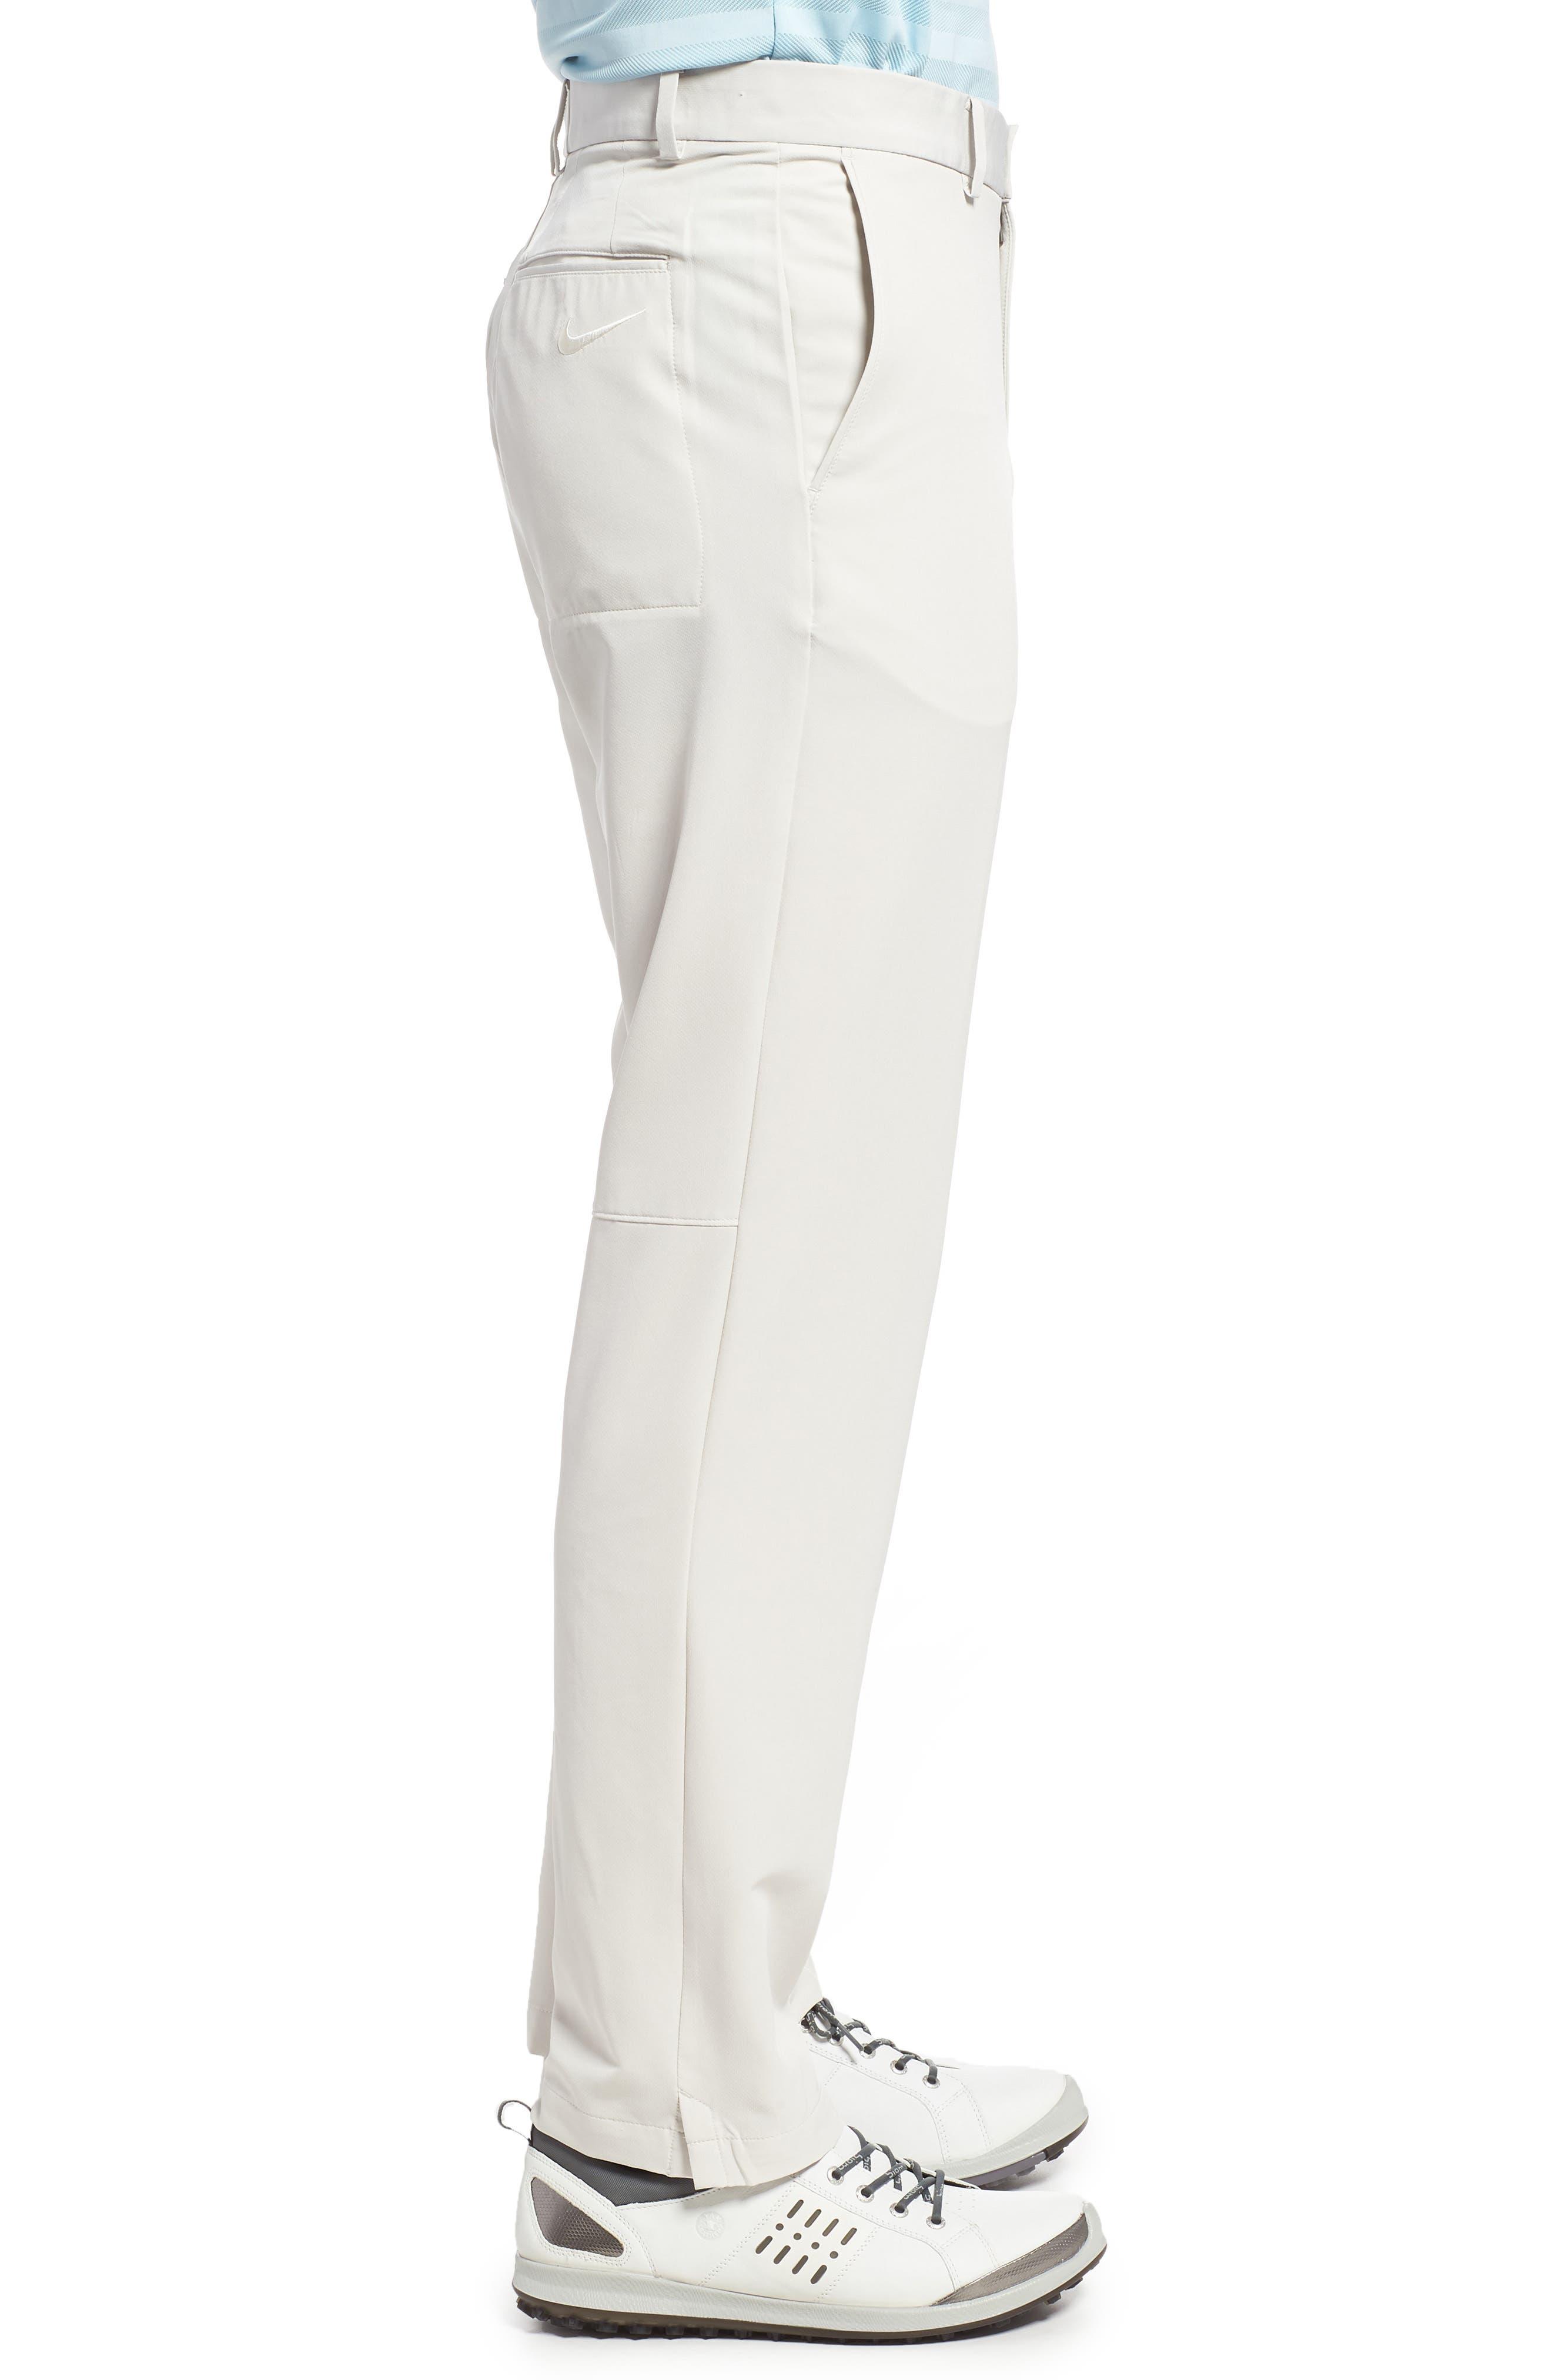 NIKE,                             Hybrid Flex Golf Pants,                             Alternate thumbnail 3, color,                             LIGHT BONE/ LIGHT BONE